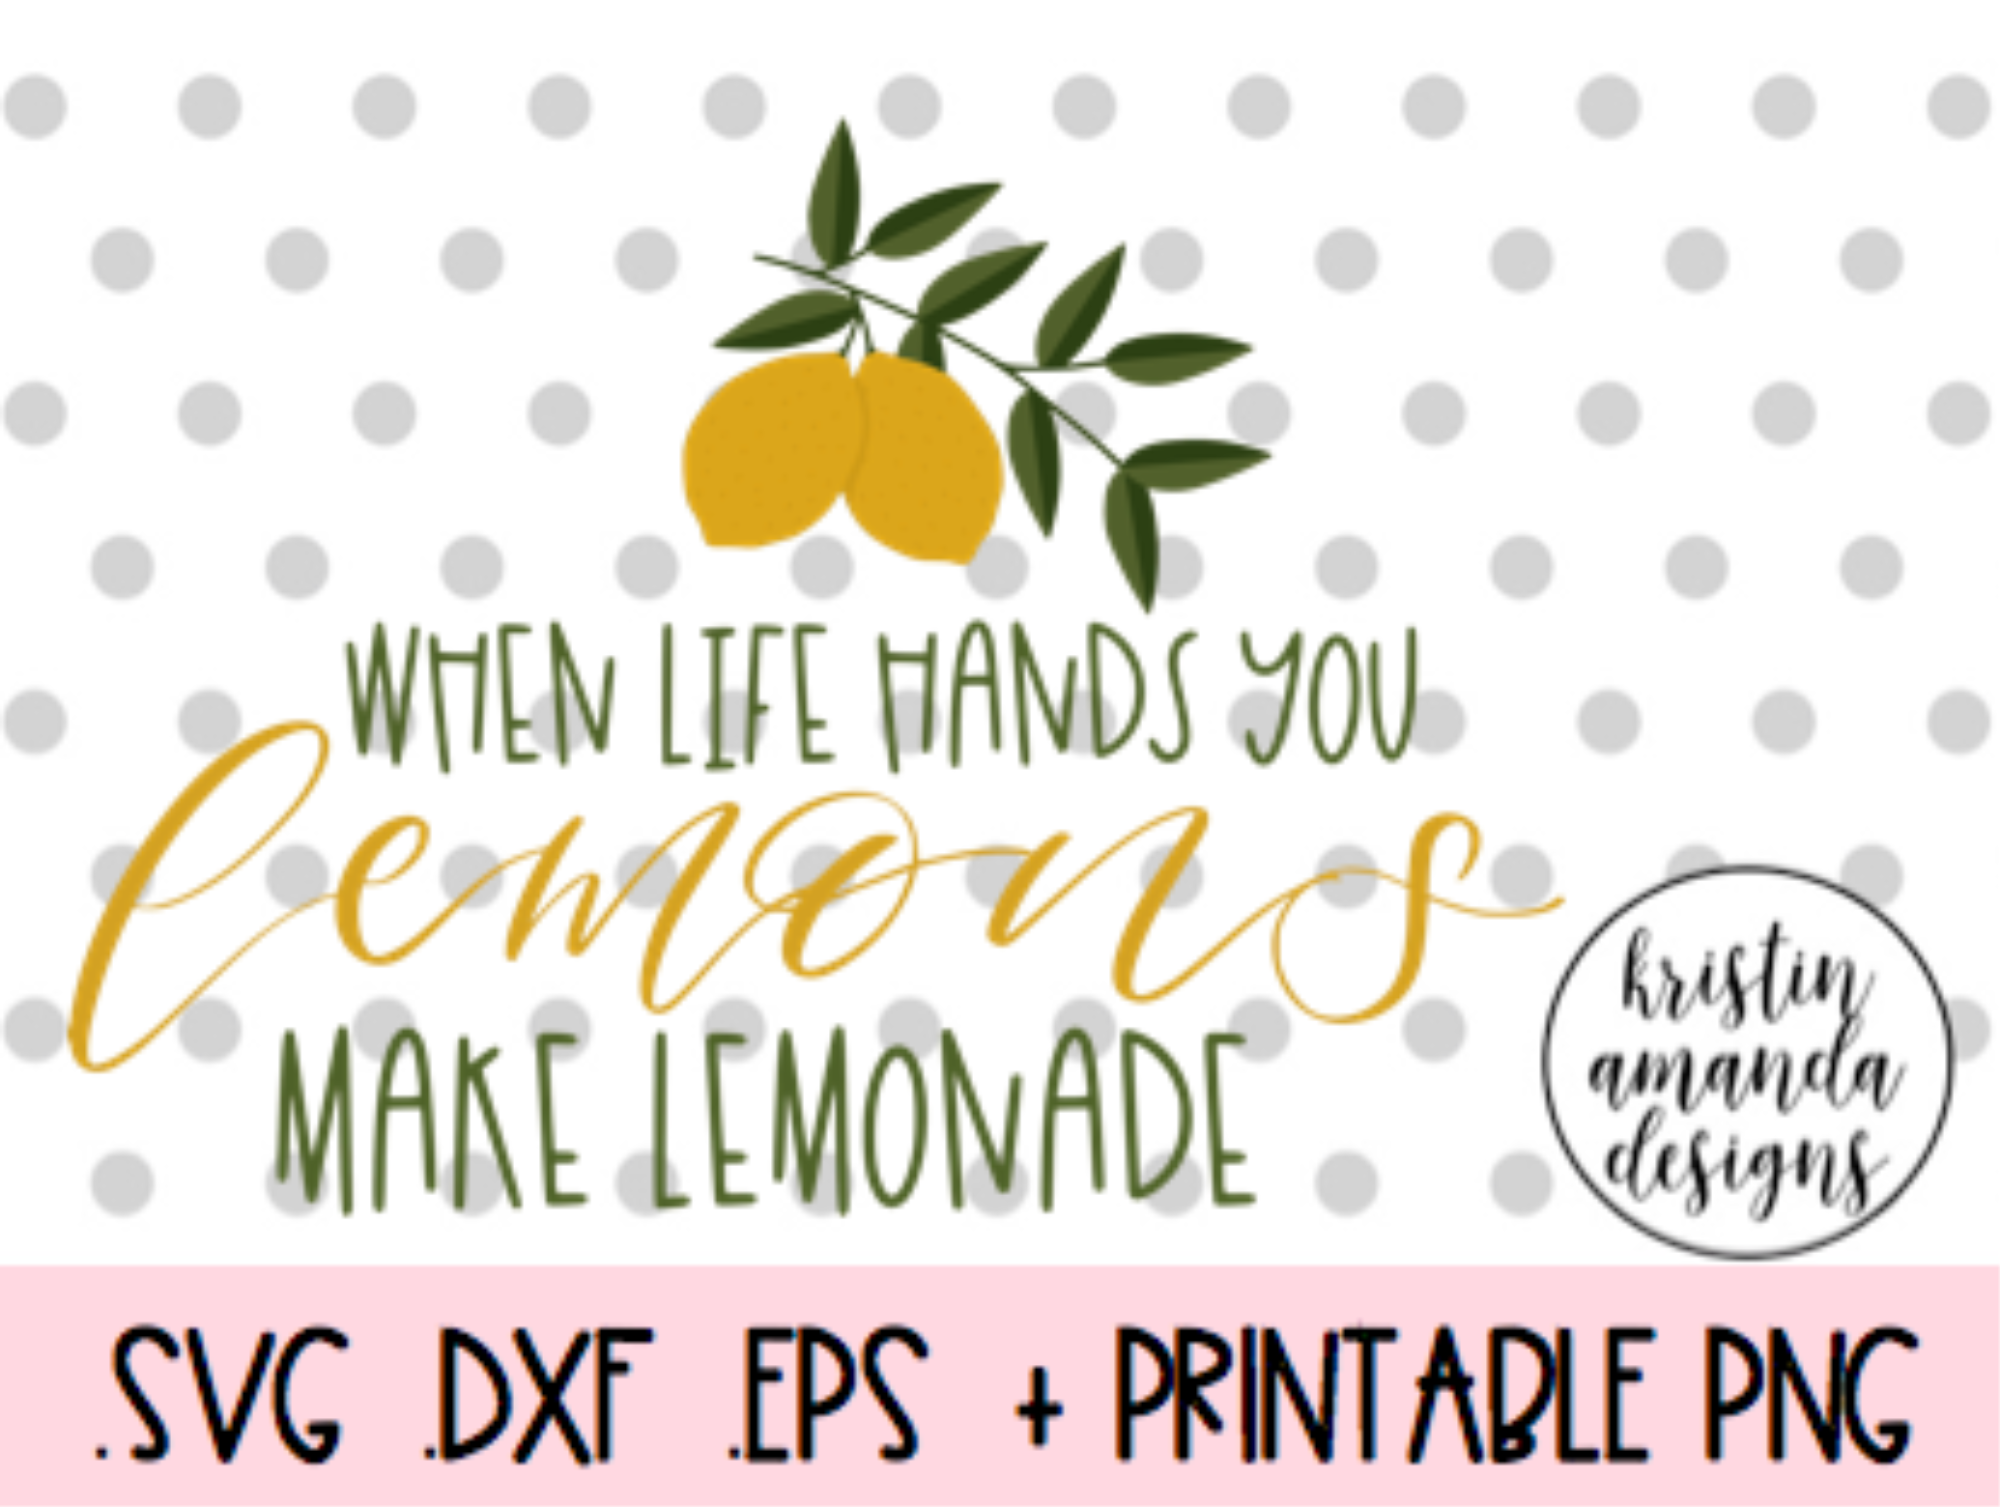 When Life Hands You Lemons Make Lemonade Stand Svg Dxf Eps Png Cut